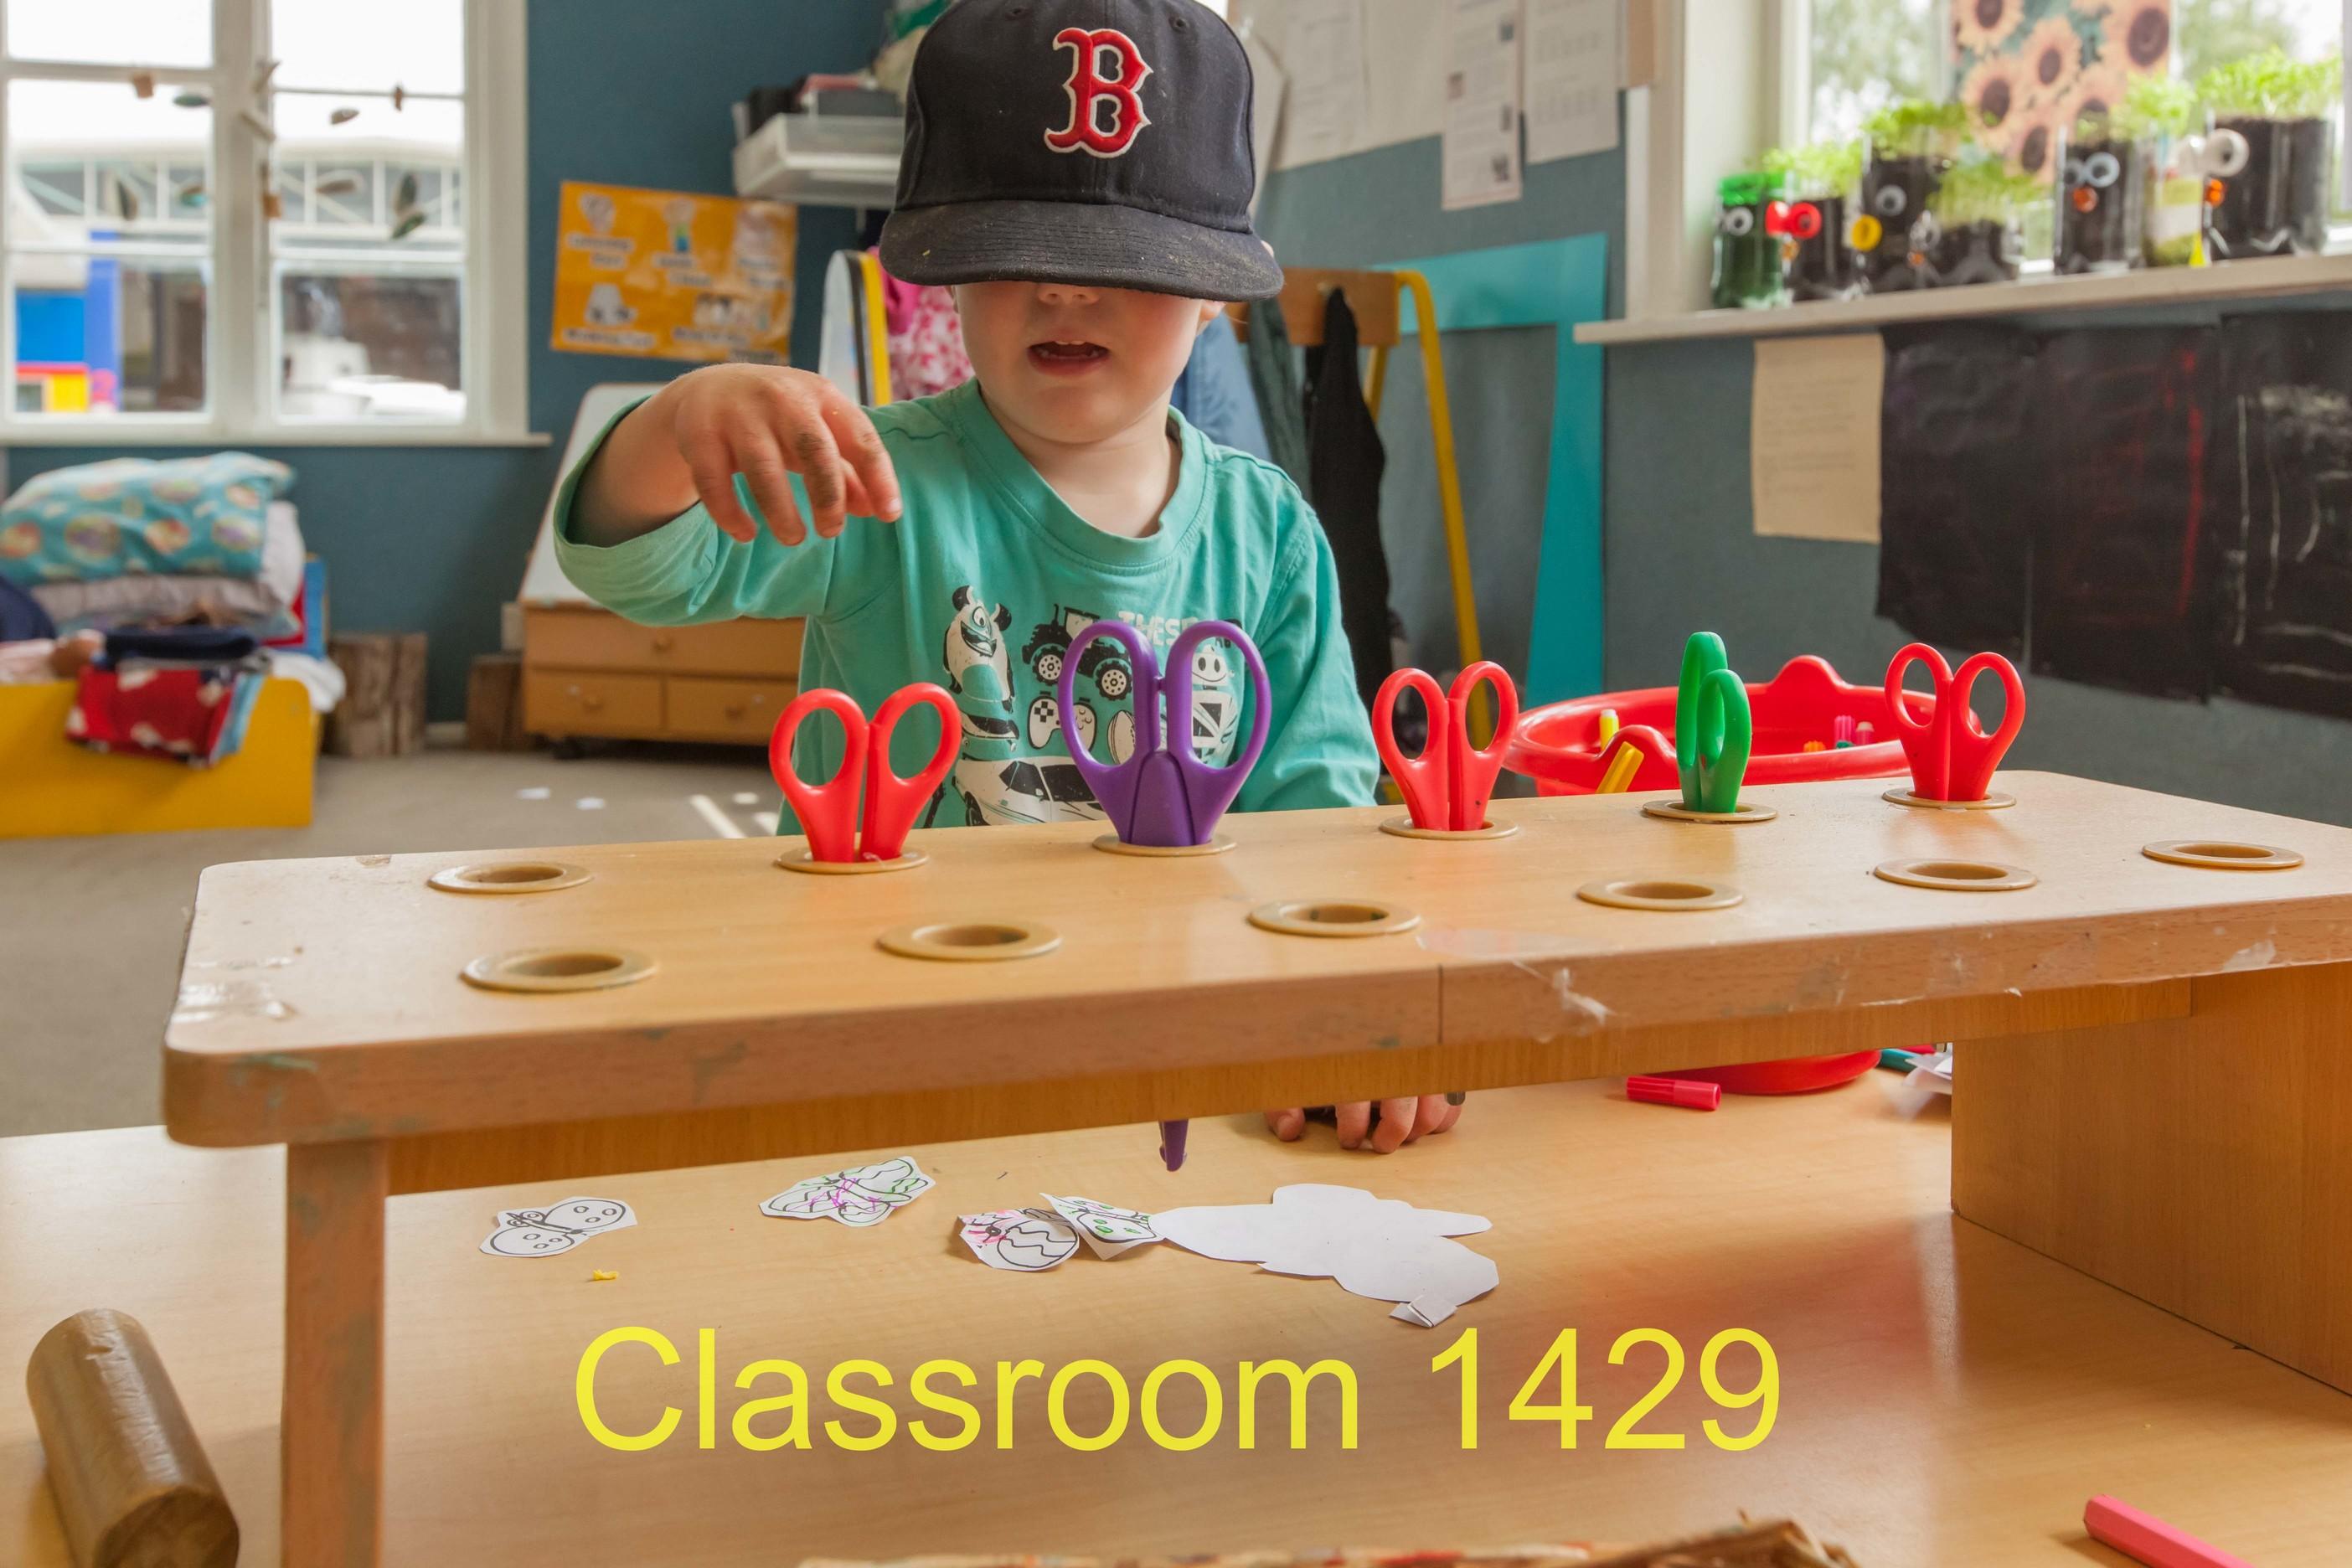 Classroom 1429